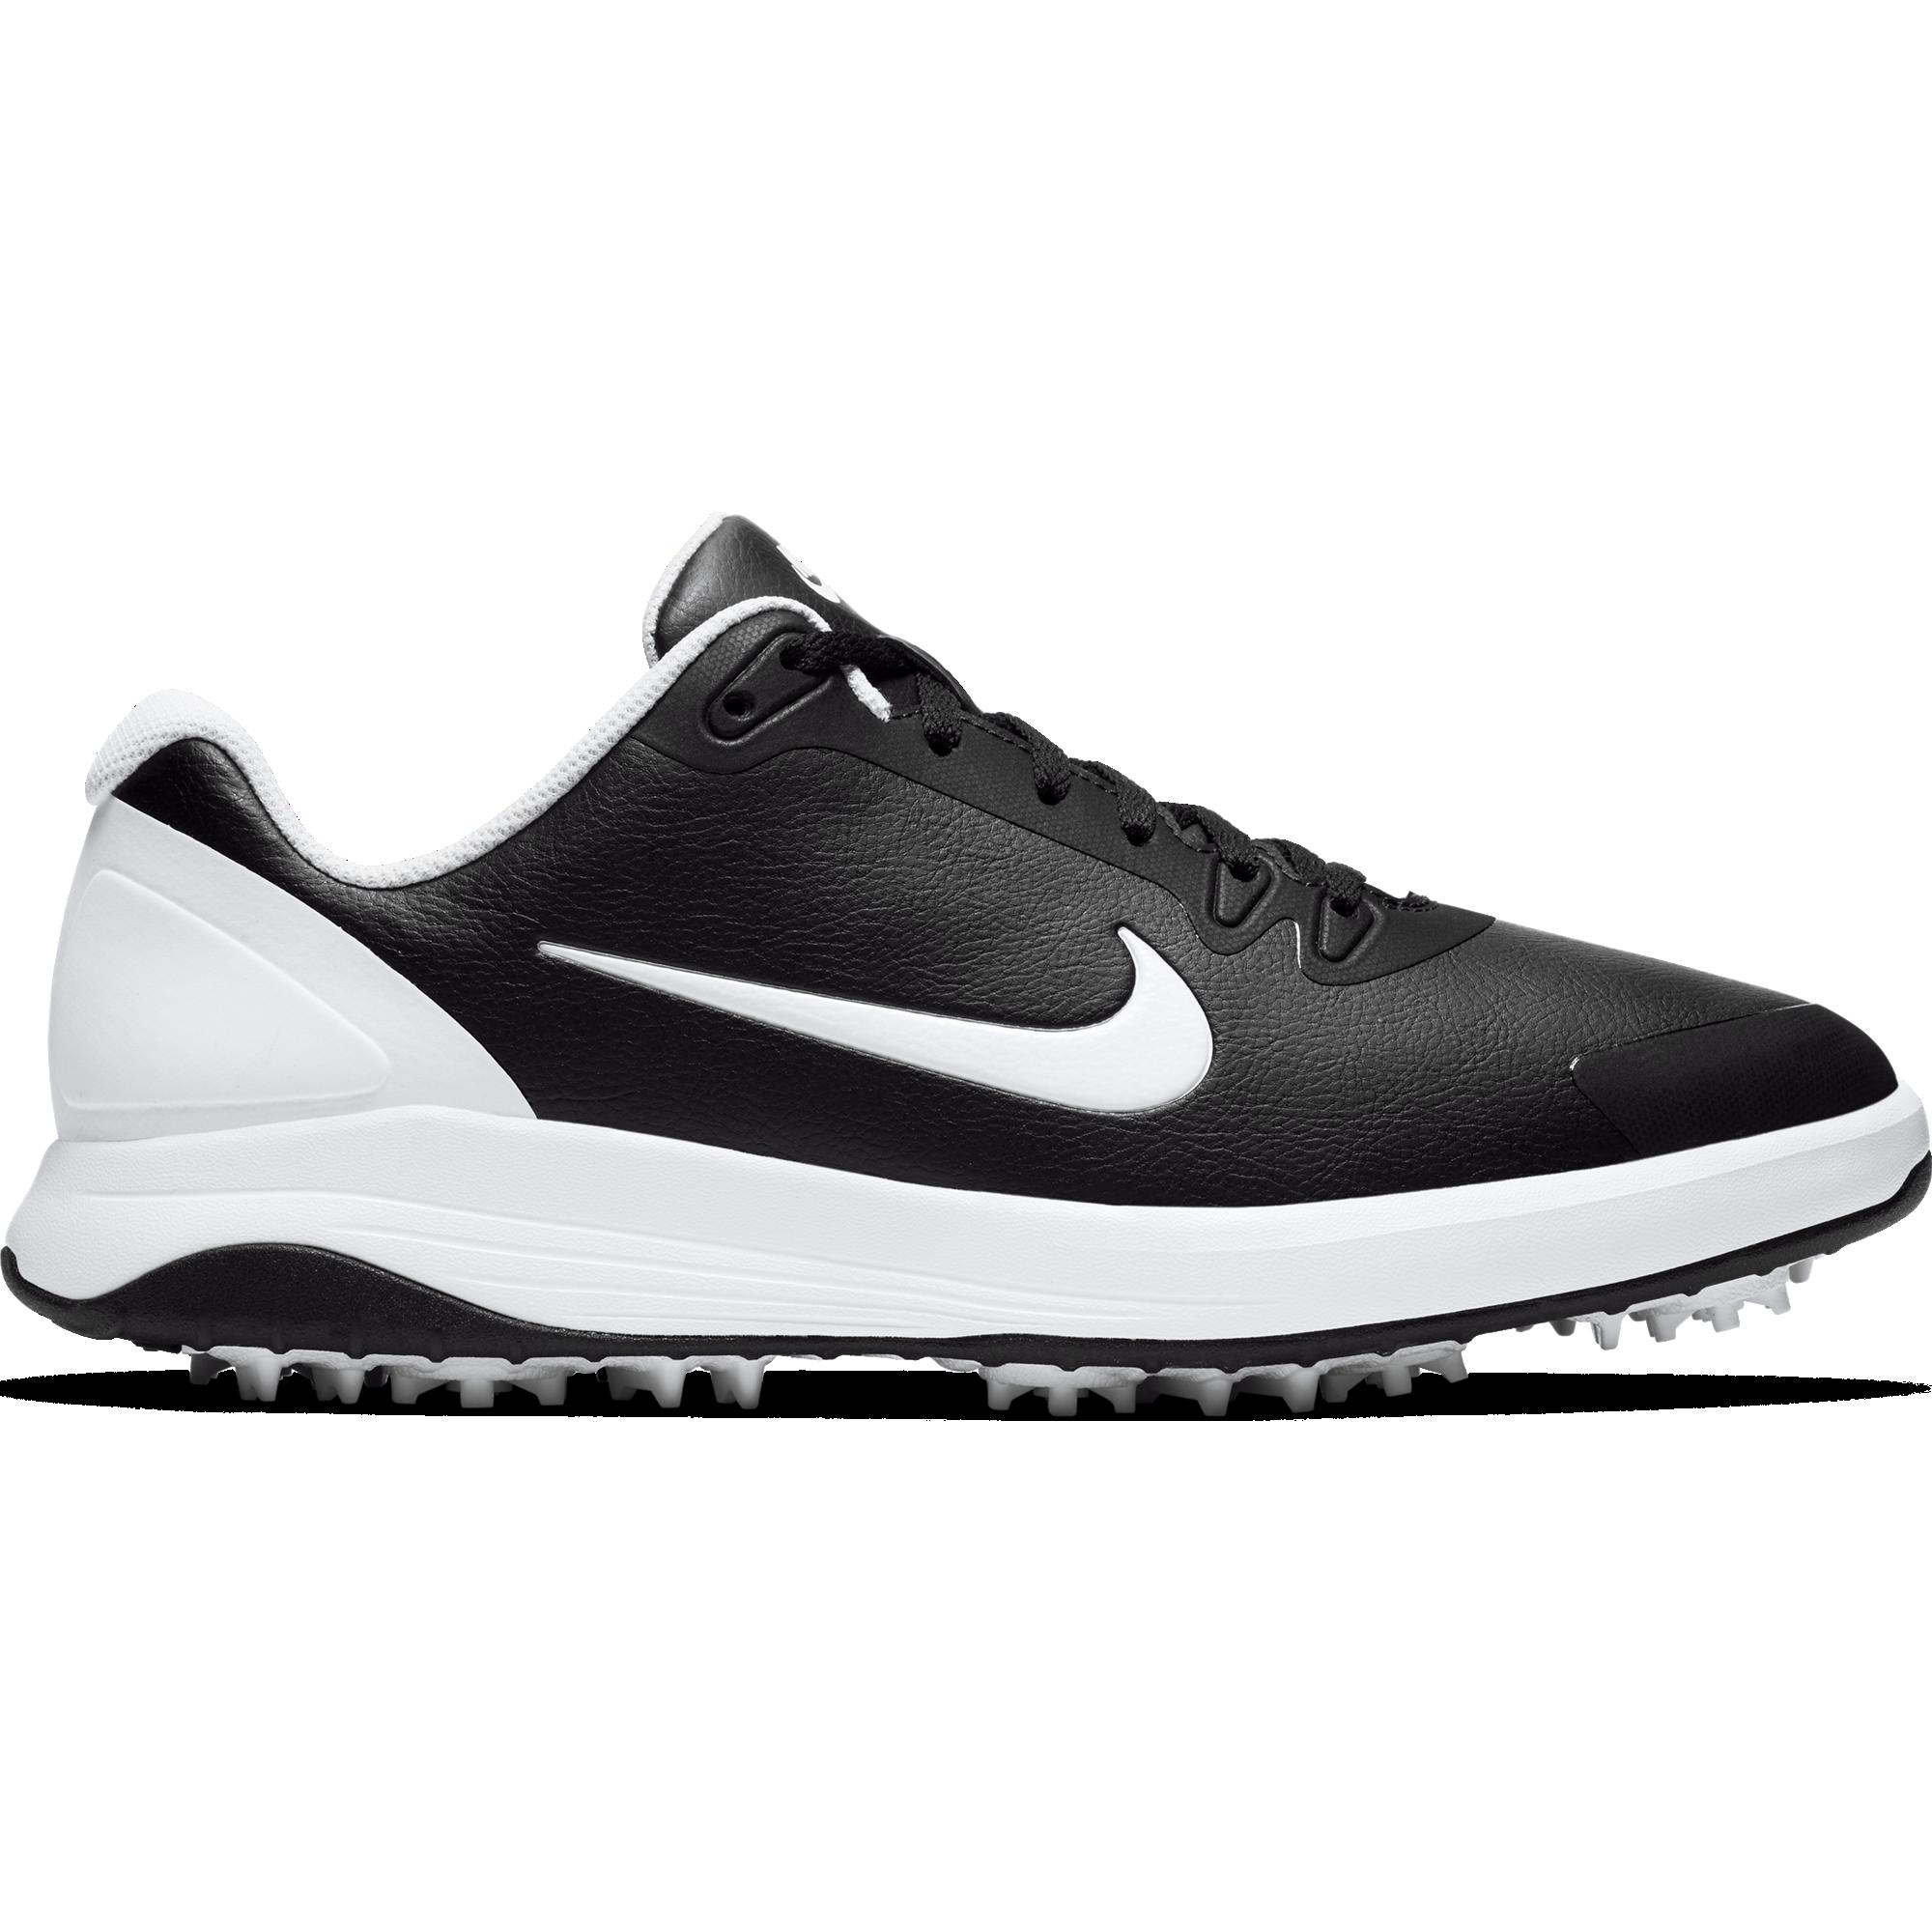 Nike Infinity G Men's Golf Shoe - Black/White | PGA TOUR Superstore